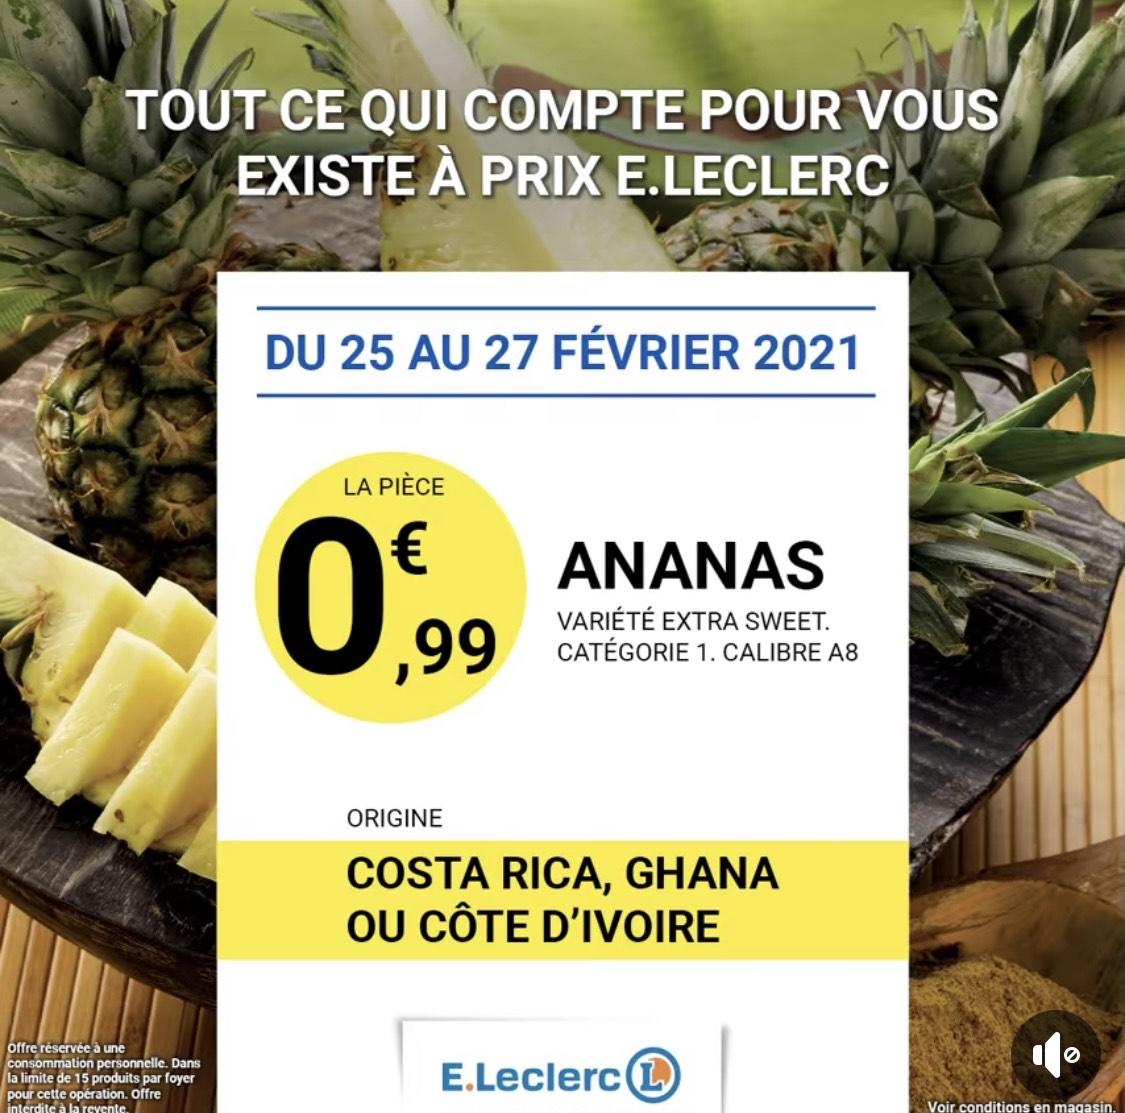 Ananas Extra Sweet - La Pièce, Catégorie 1